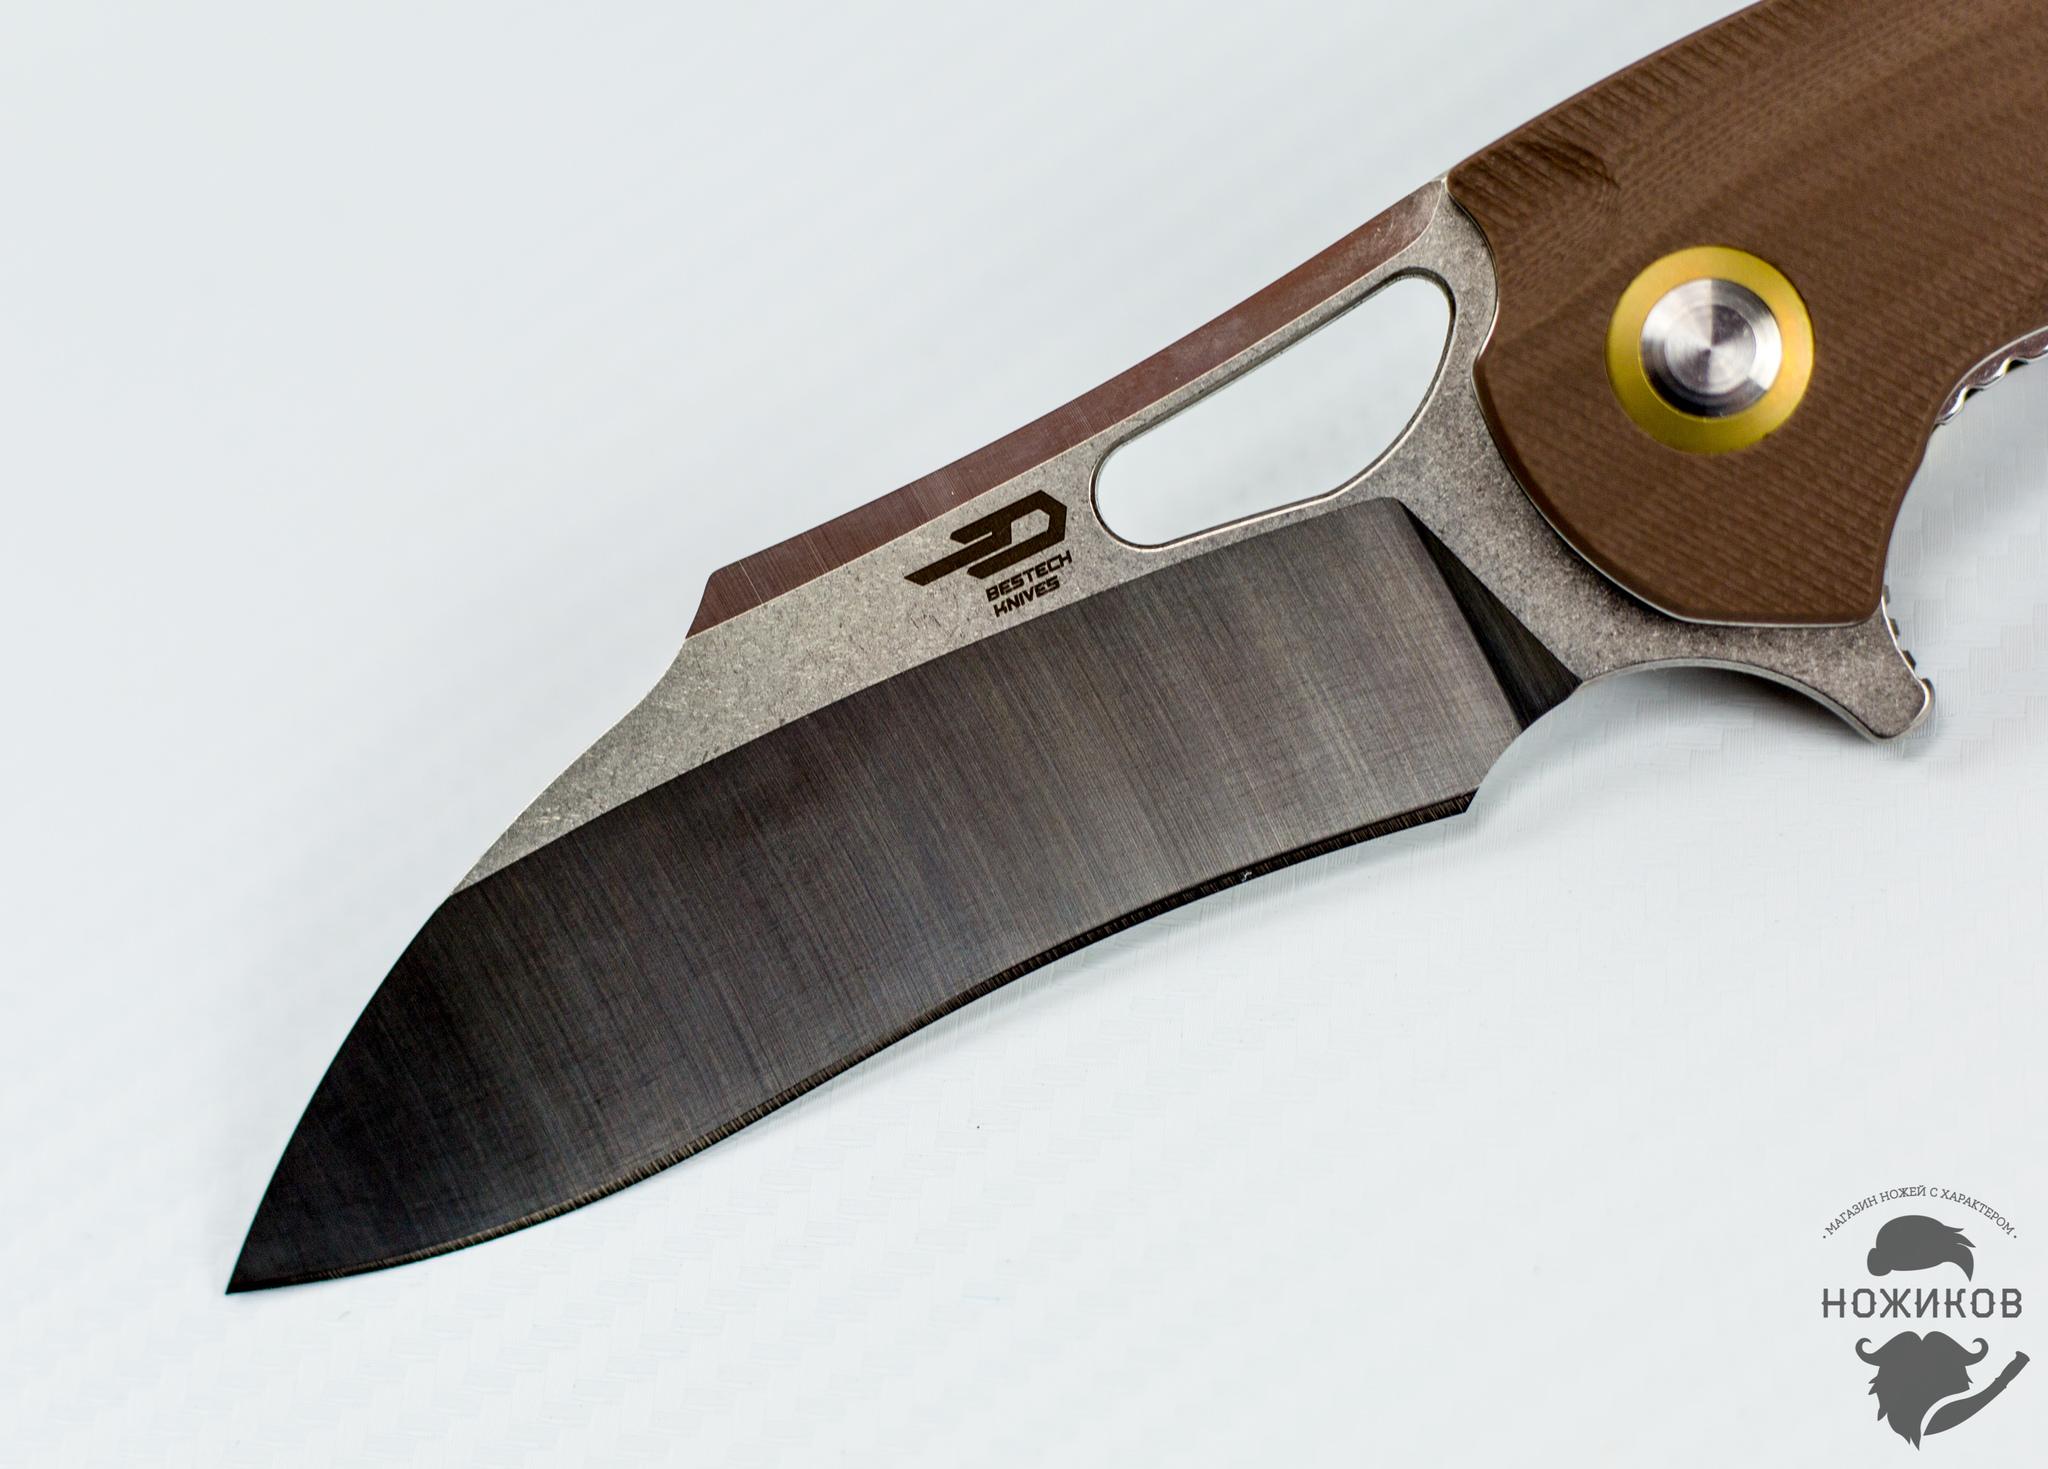 Фото 7 - Складной нож Bestech Rhino BG08B, сталь 154CM от Bestech Knives